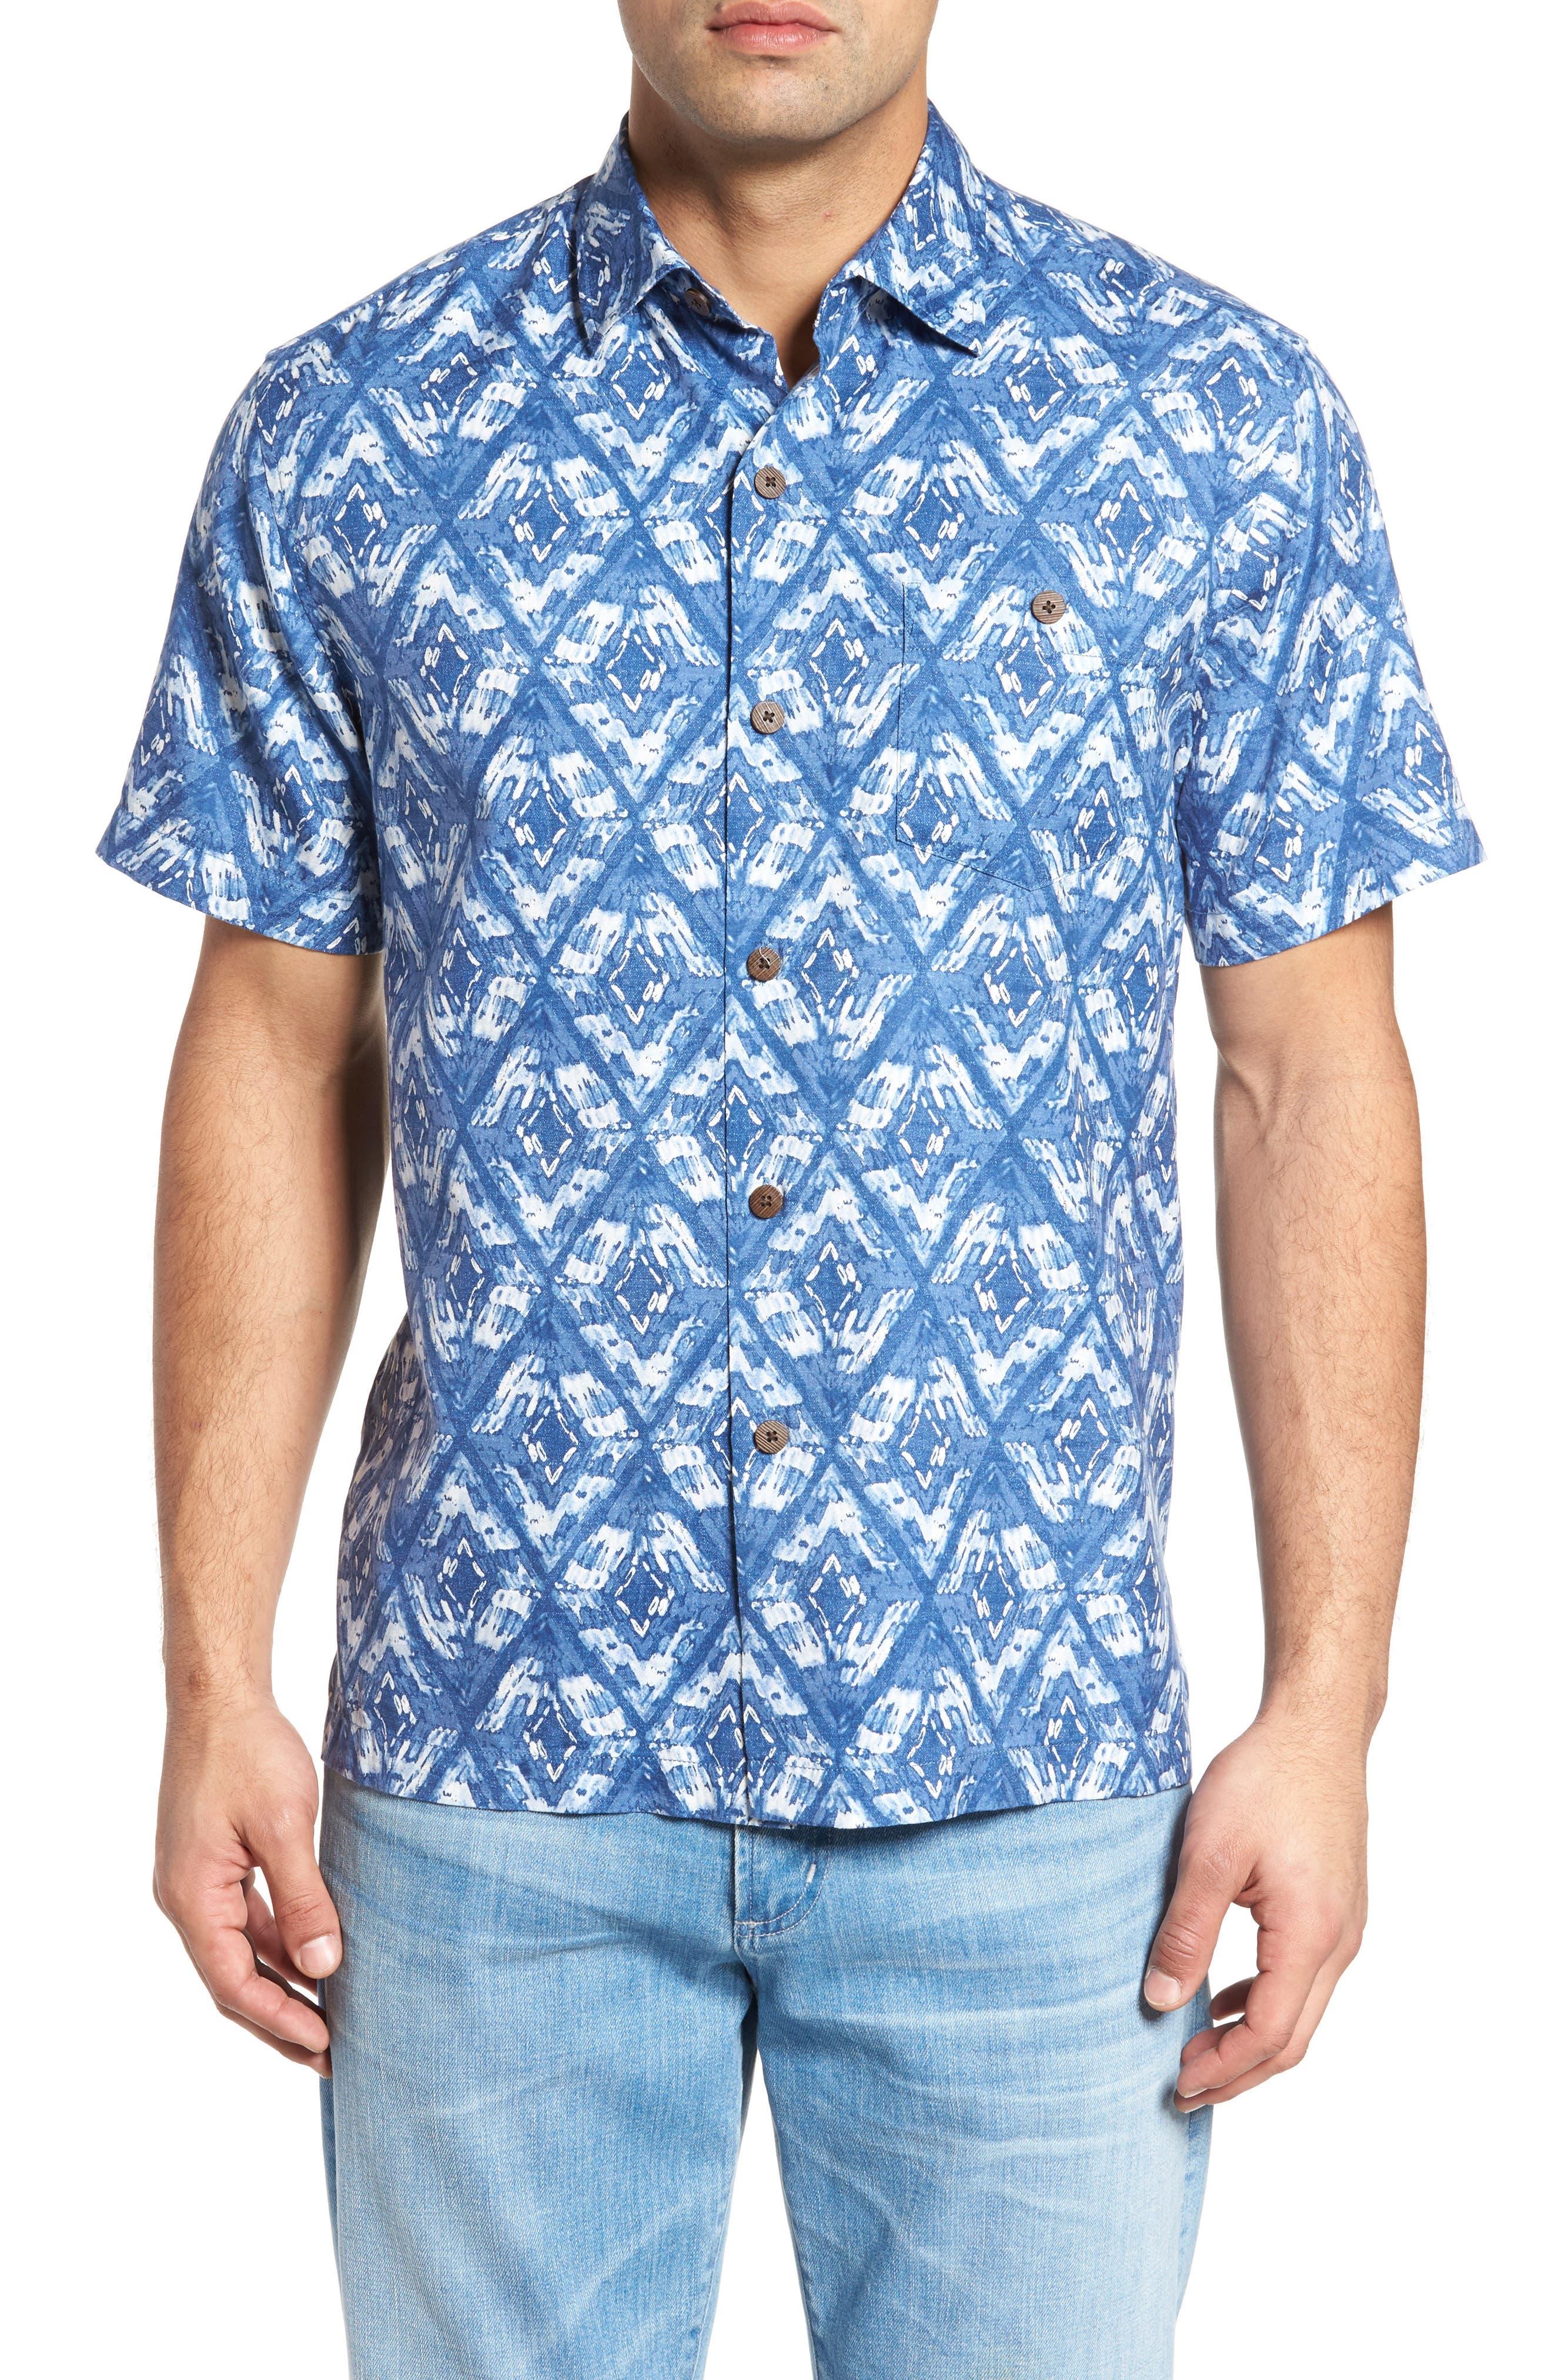 Main Image - Tommy Bahama Deep Water Diamond Camp Shirt